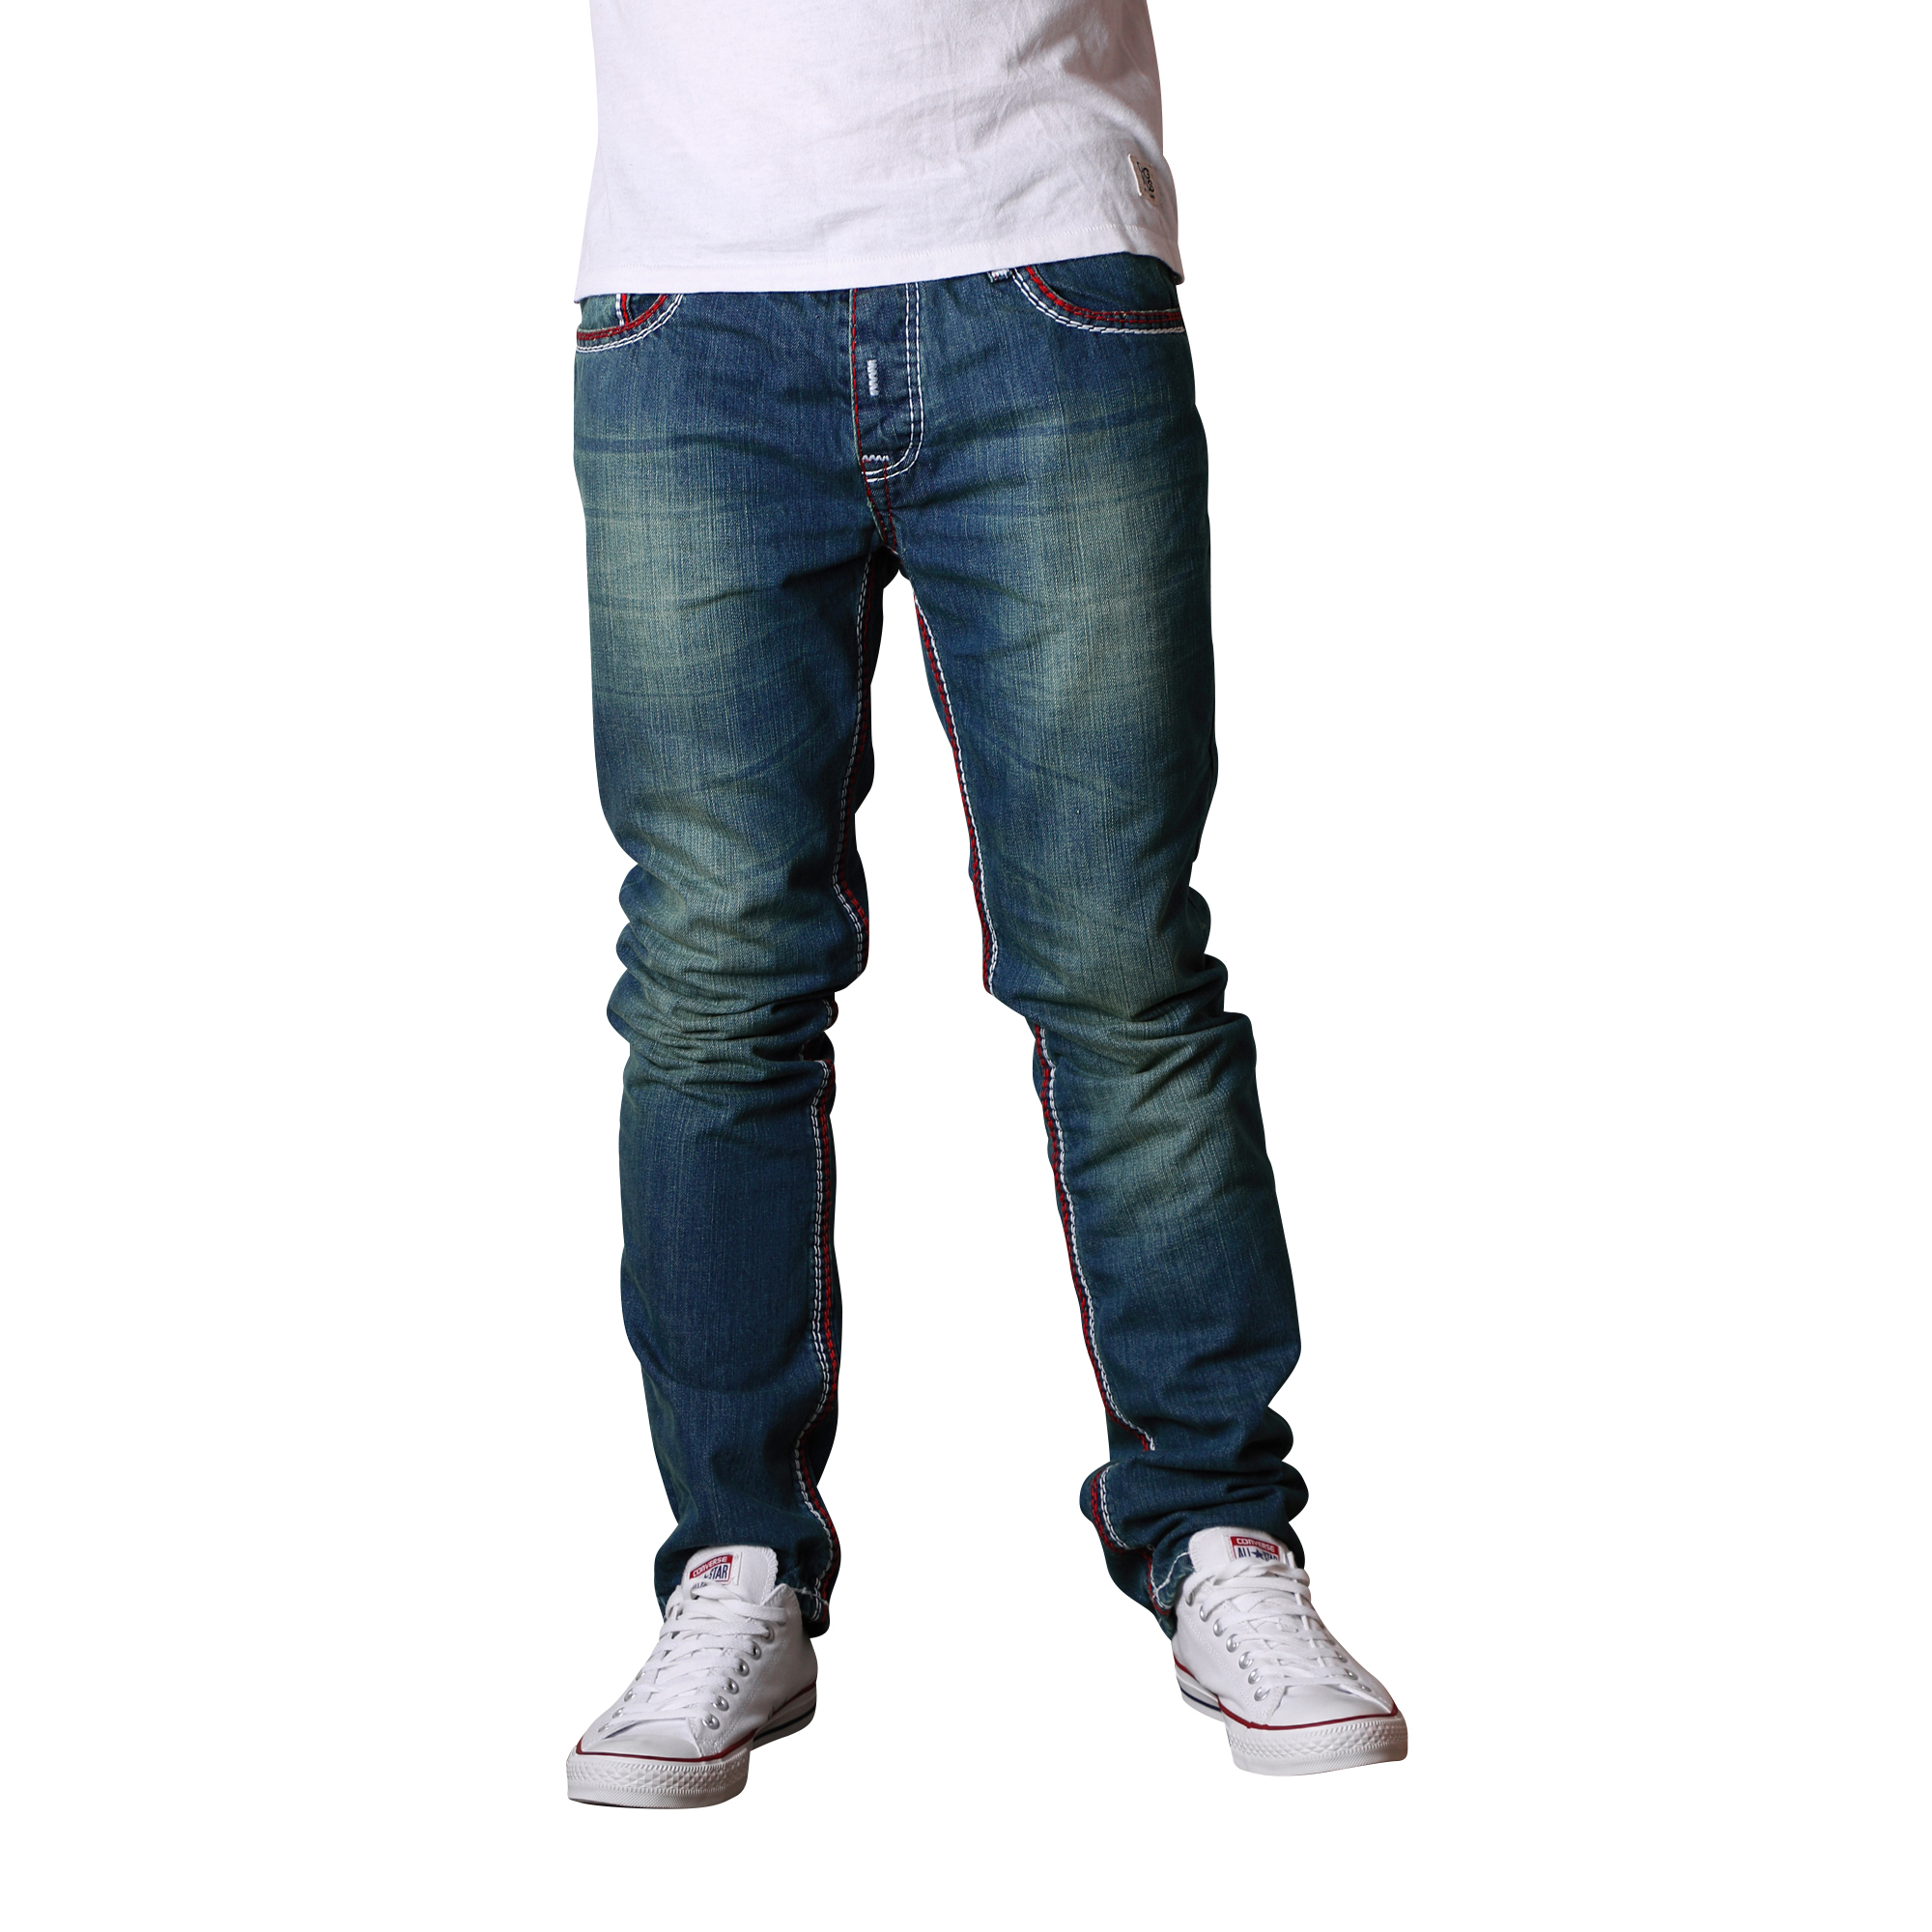 herren jeans straight cut hose dicke zier naht vintage clubwear blau rote naht ebay. Black Bedroom Furniture Sets. Home Design Ideas